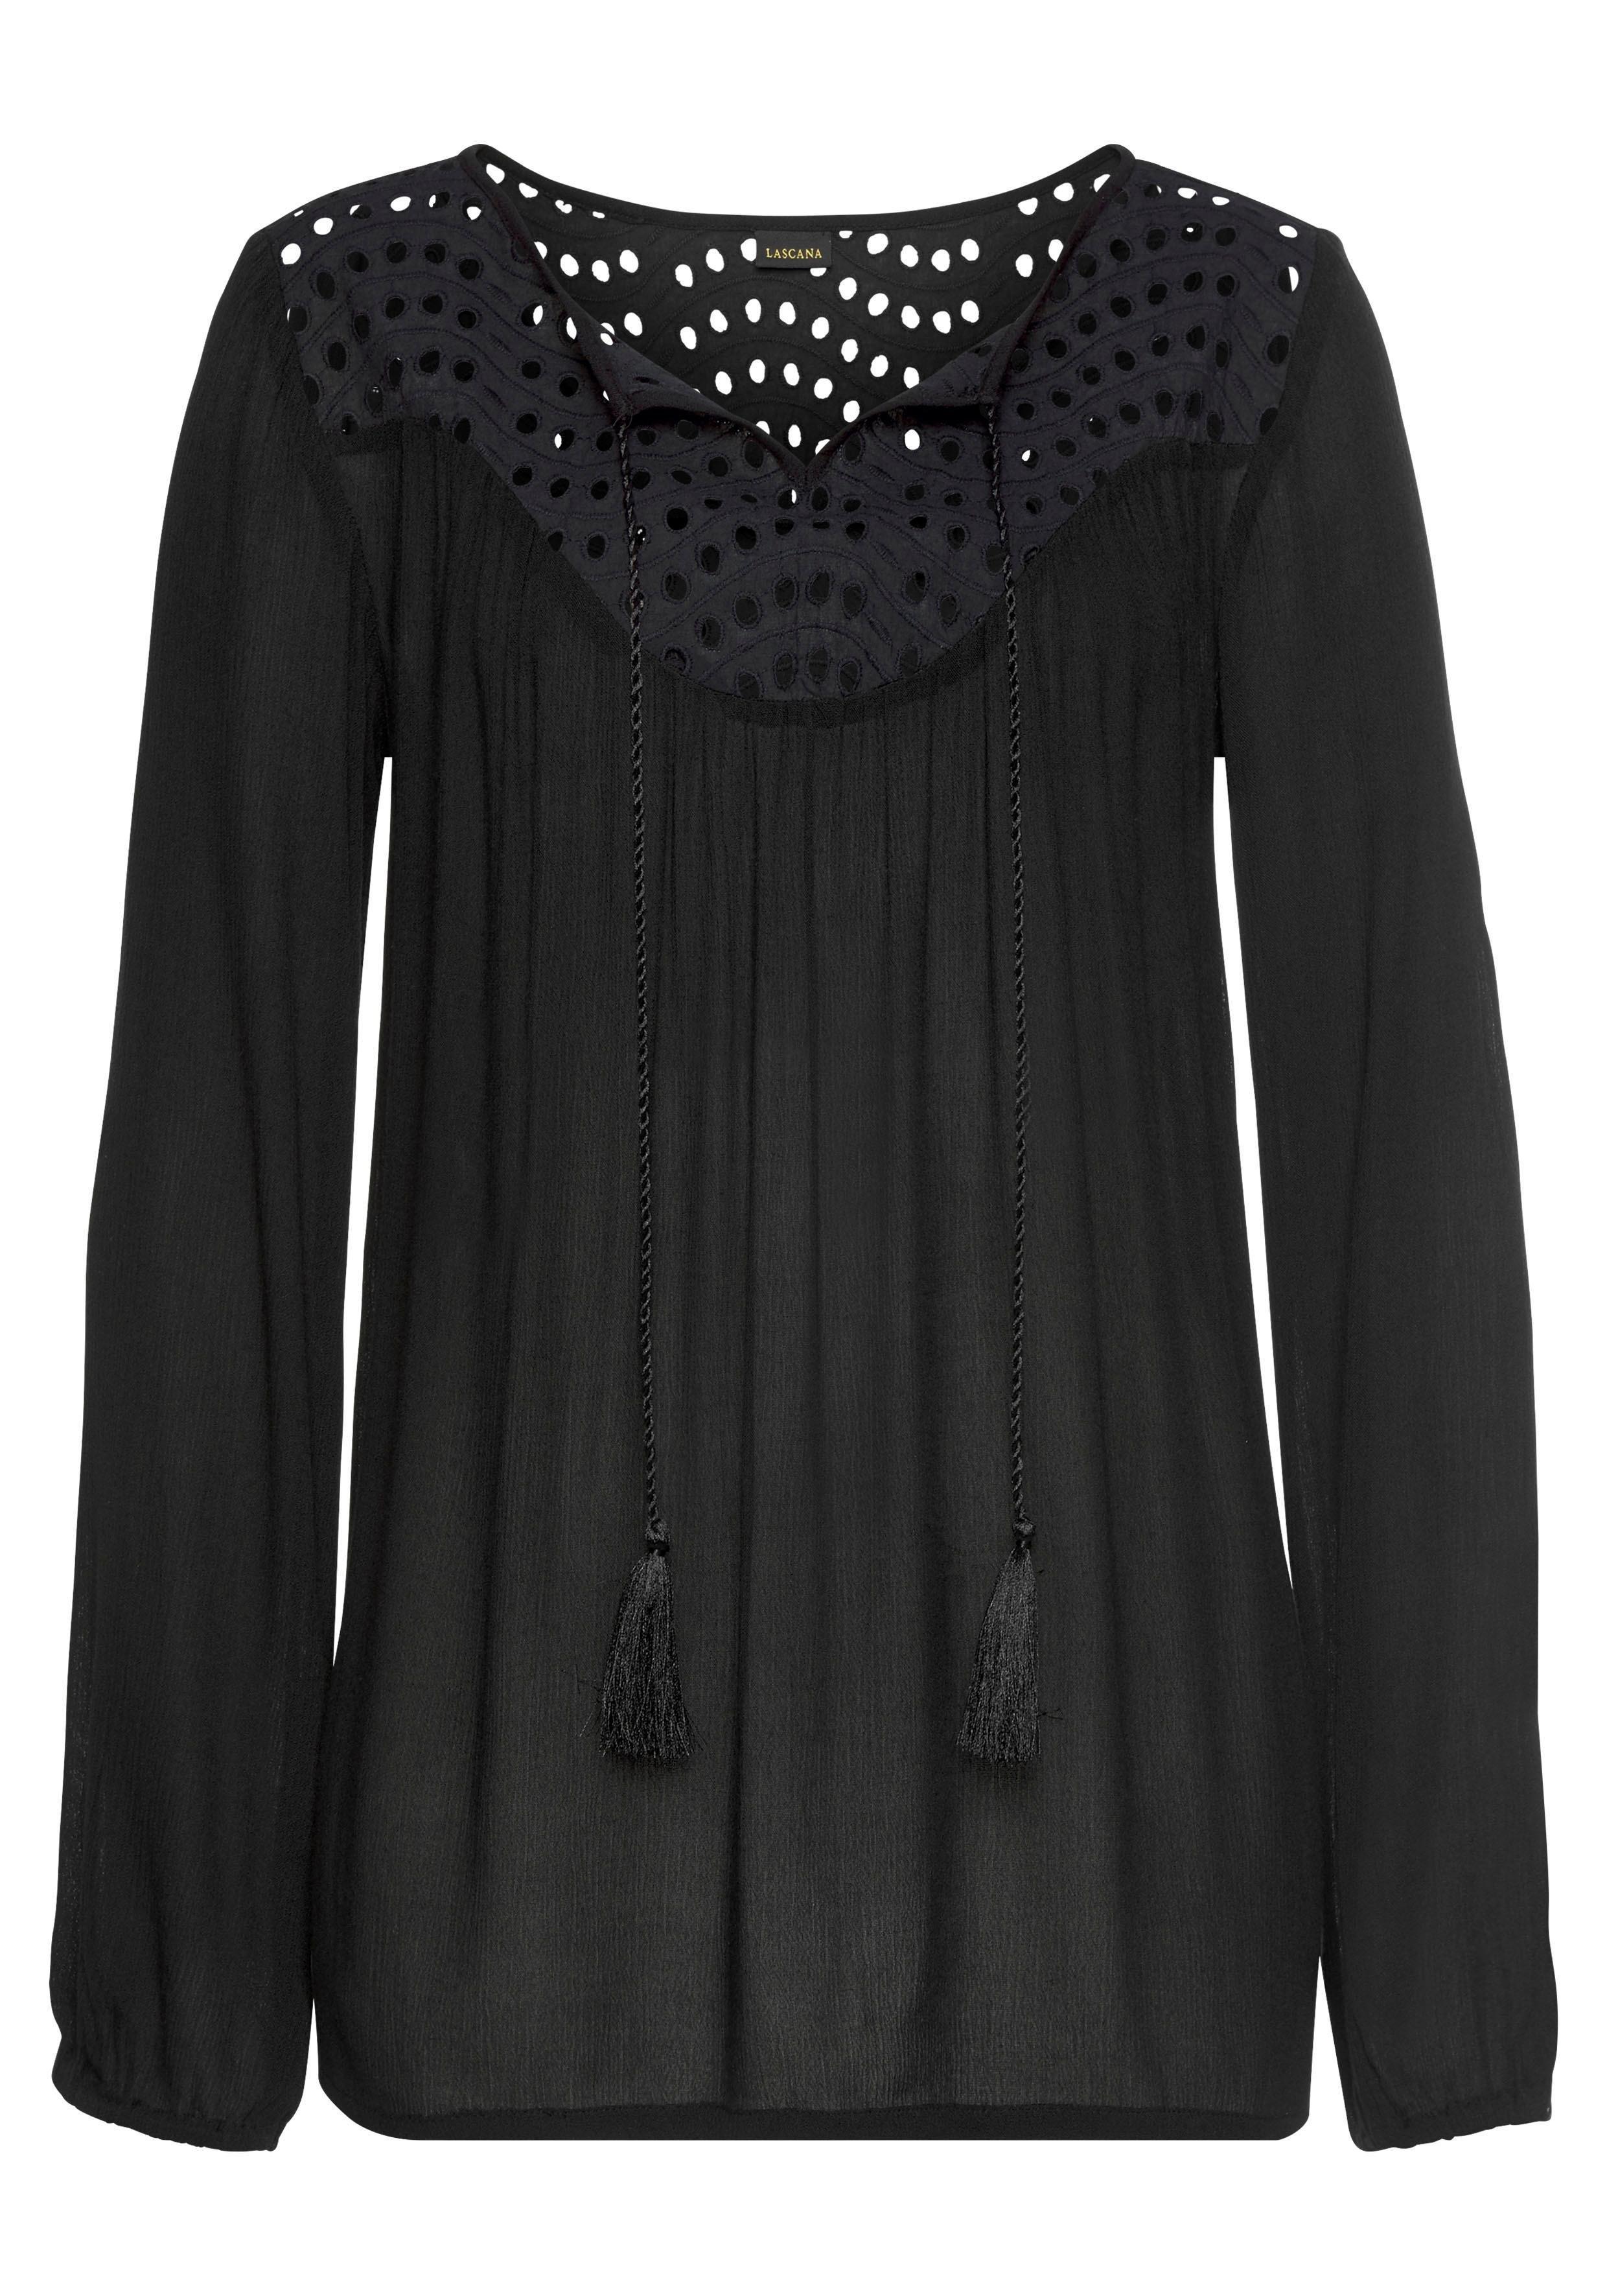 Lascana crêpe-blouse met broderie anglaise bij Lascana online kopen